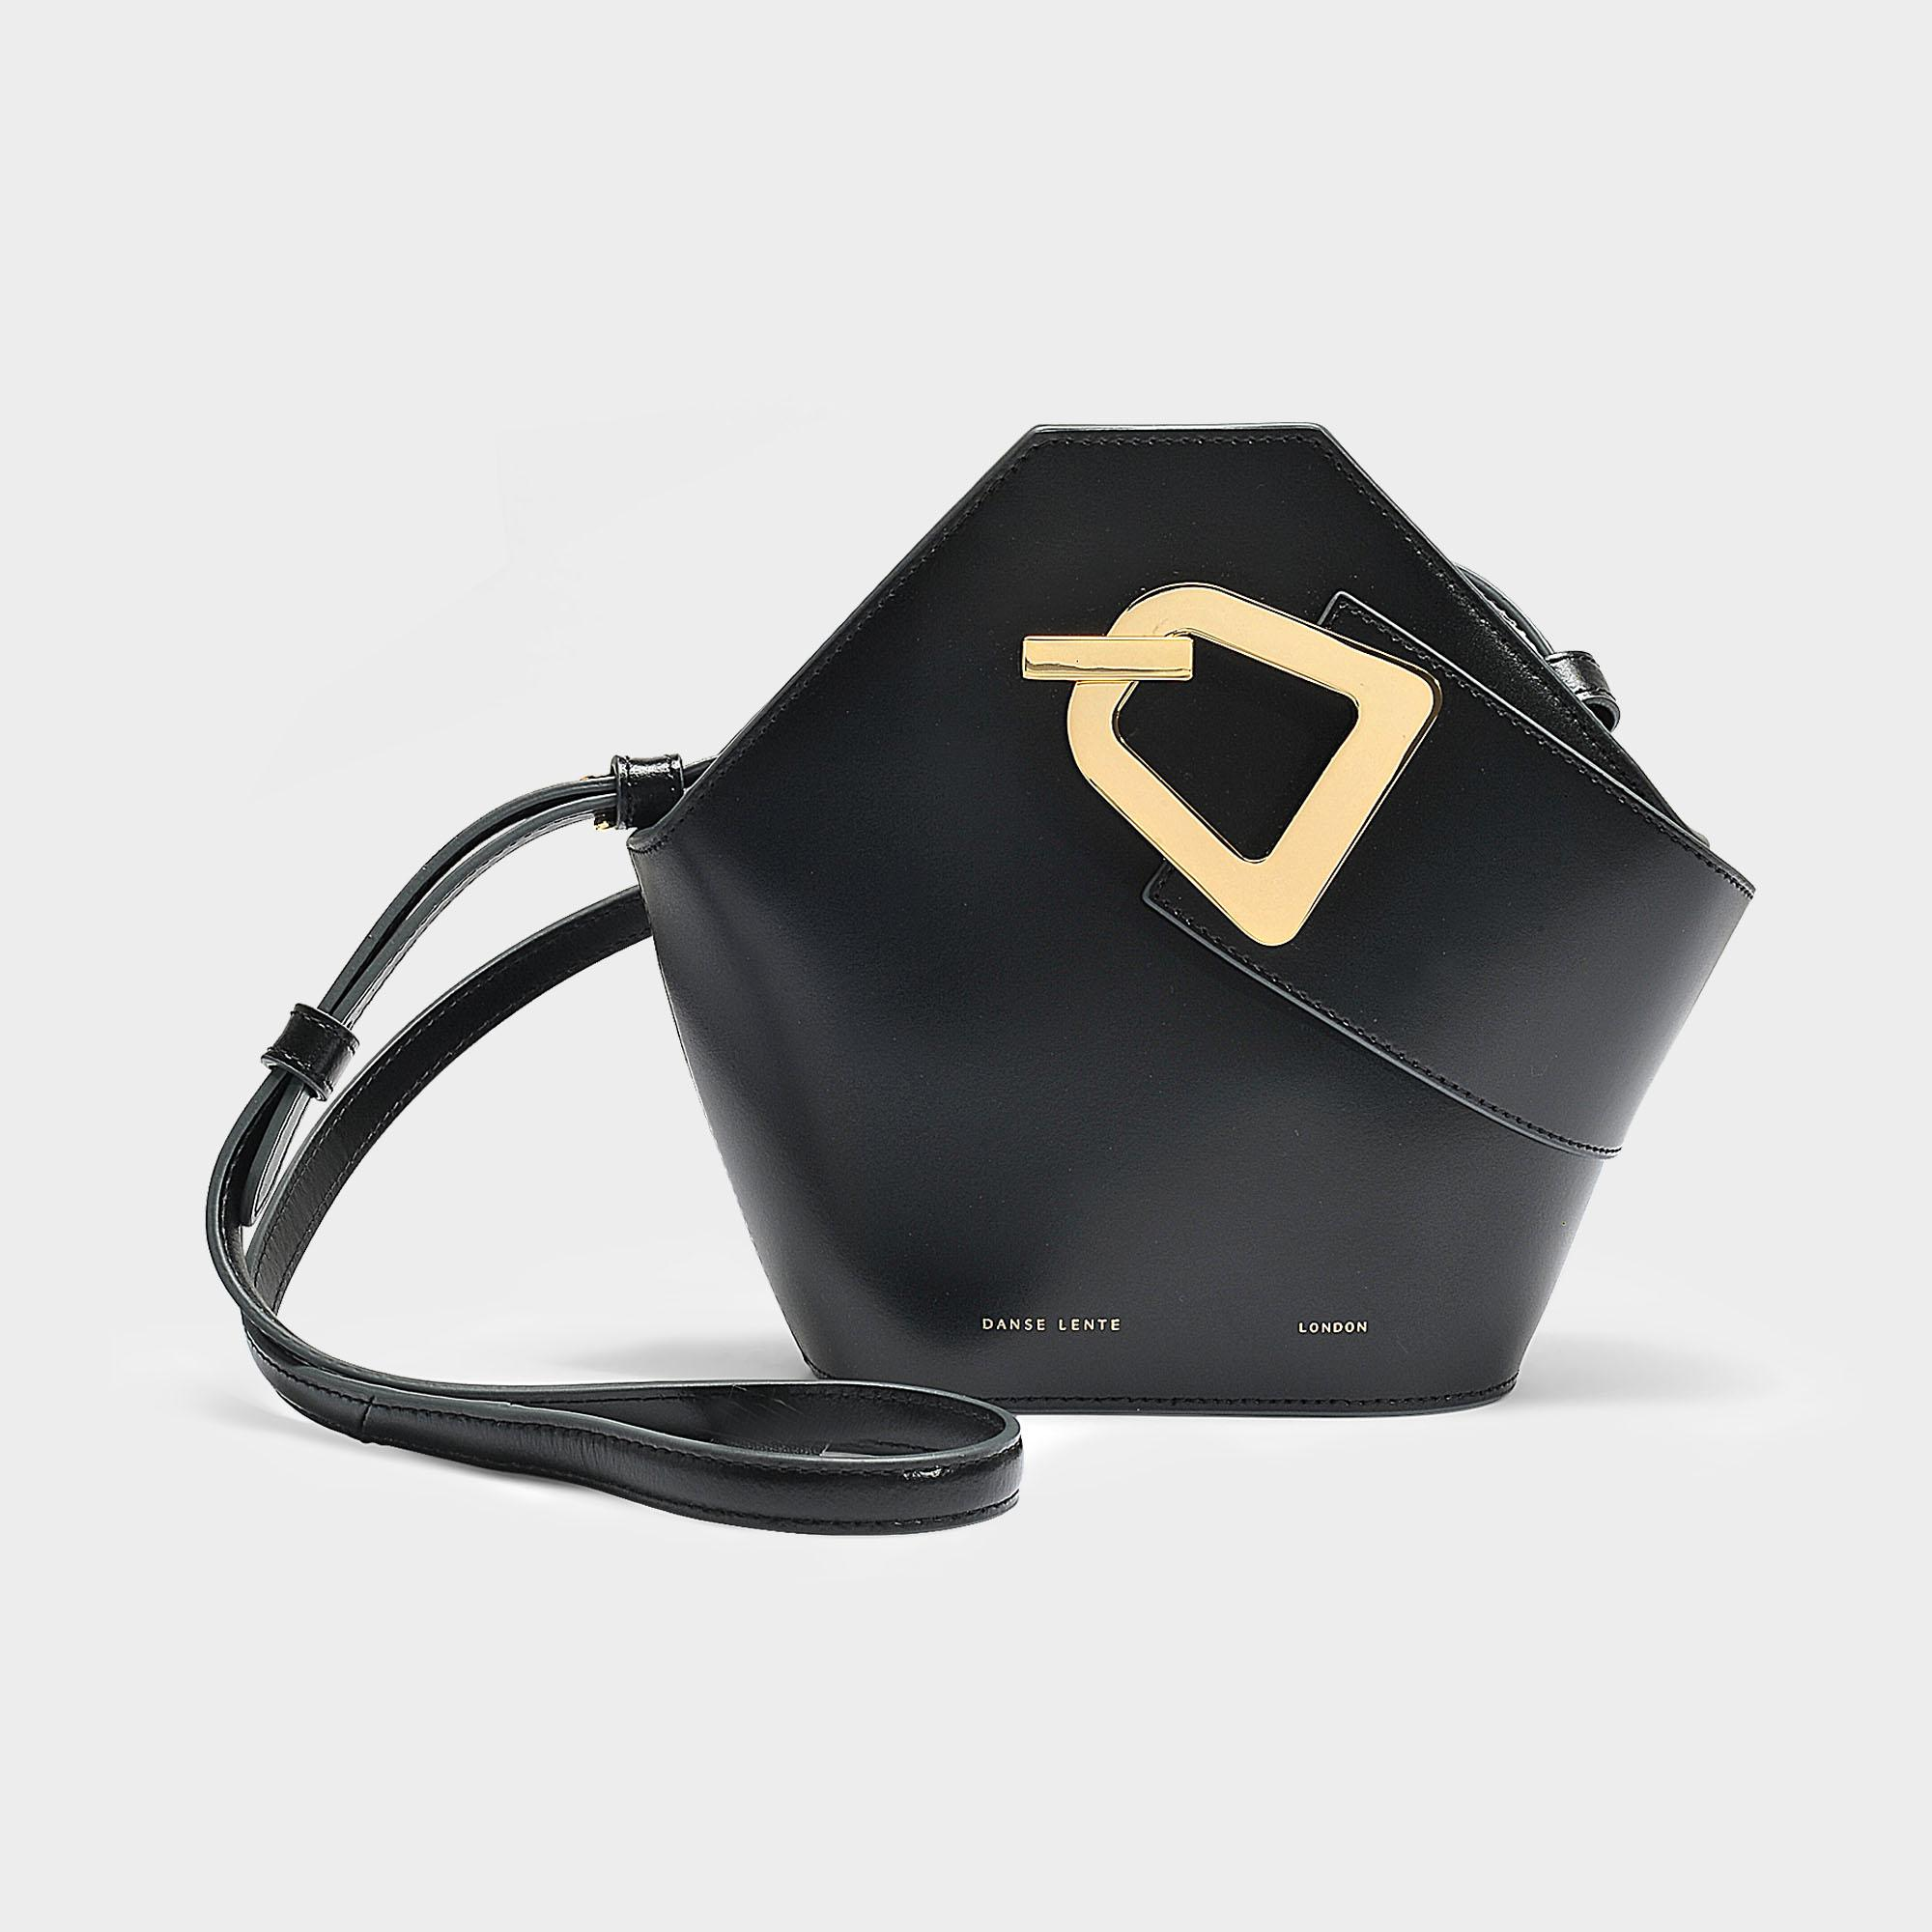 Mini Johnny Bag in Black Italian Calfskin Danse Lente ovLNkMtXUC